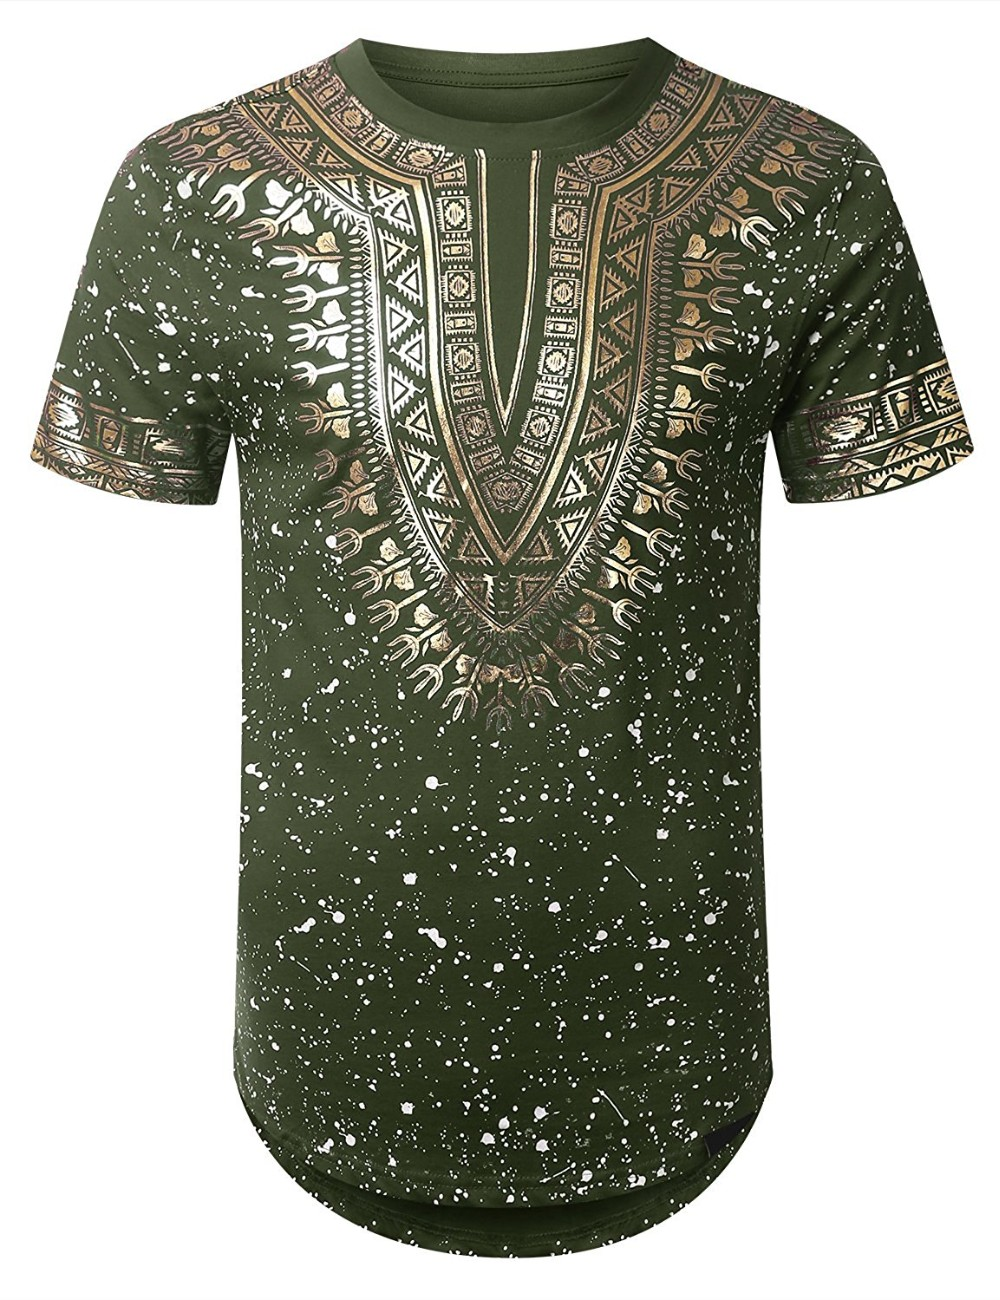 Ts171023 men 39 s paint splatter t shirt with gold foil for Foil print t shirts custom